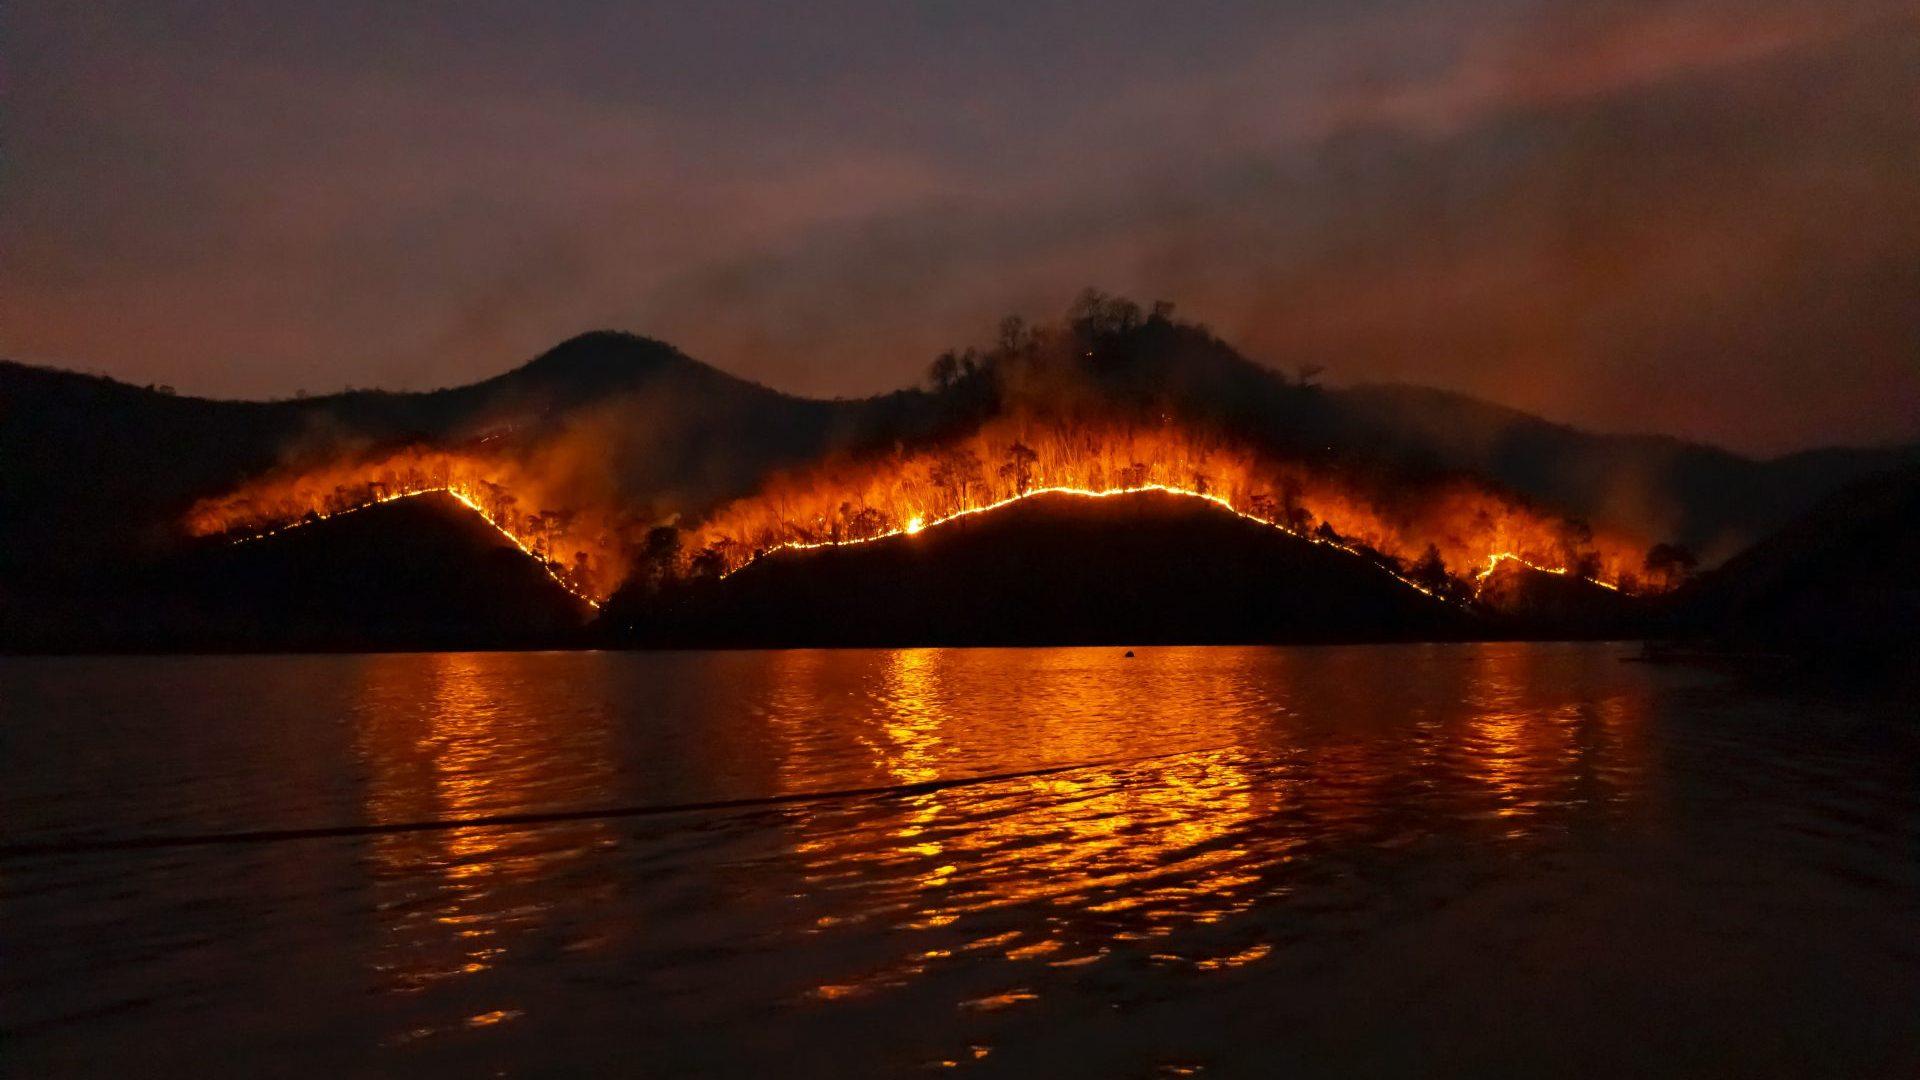 West Coast Fires continue to devastate the U.S.